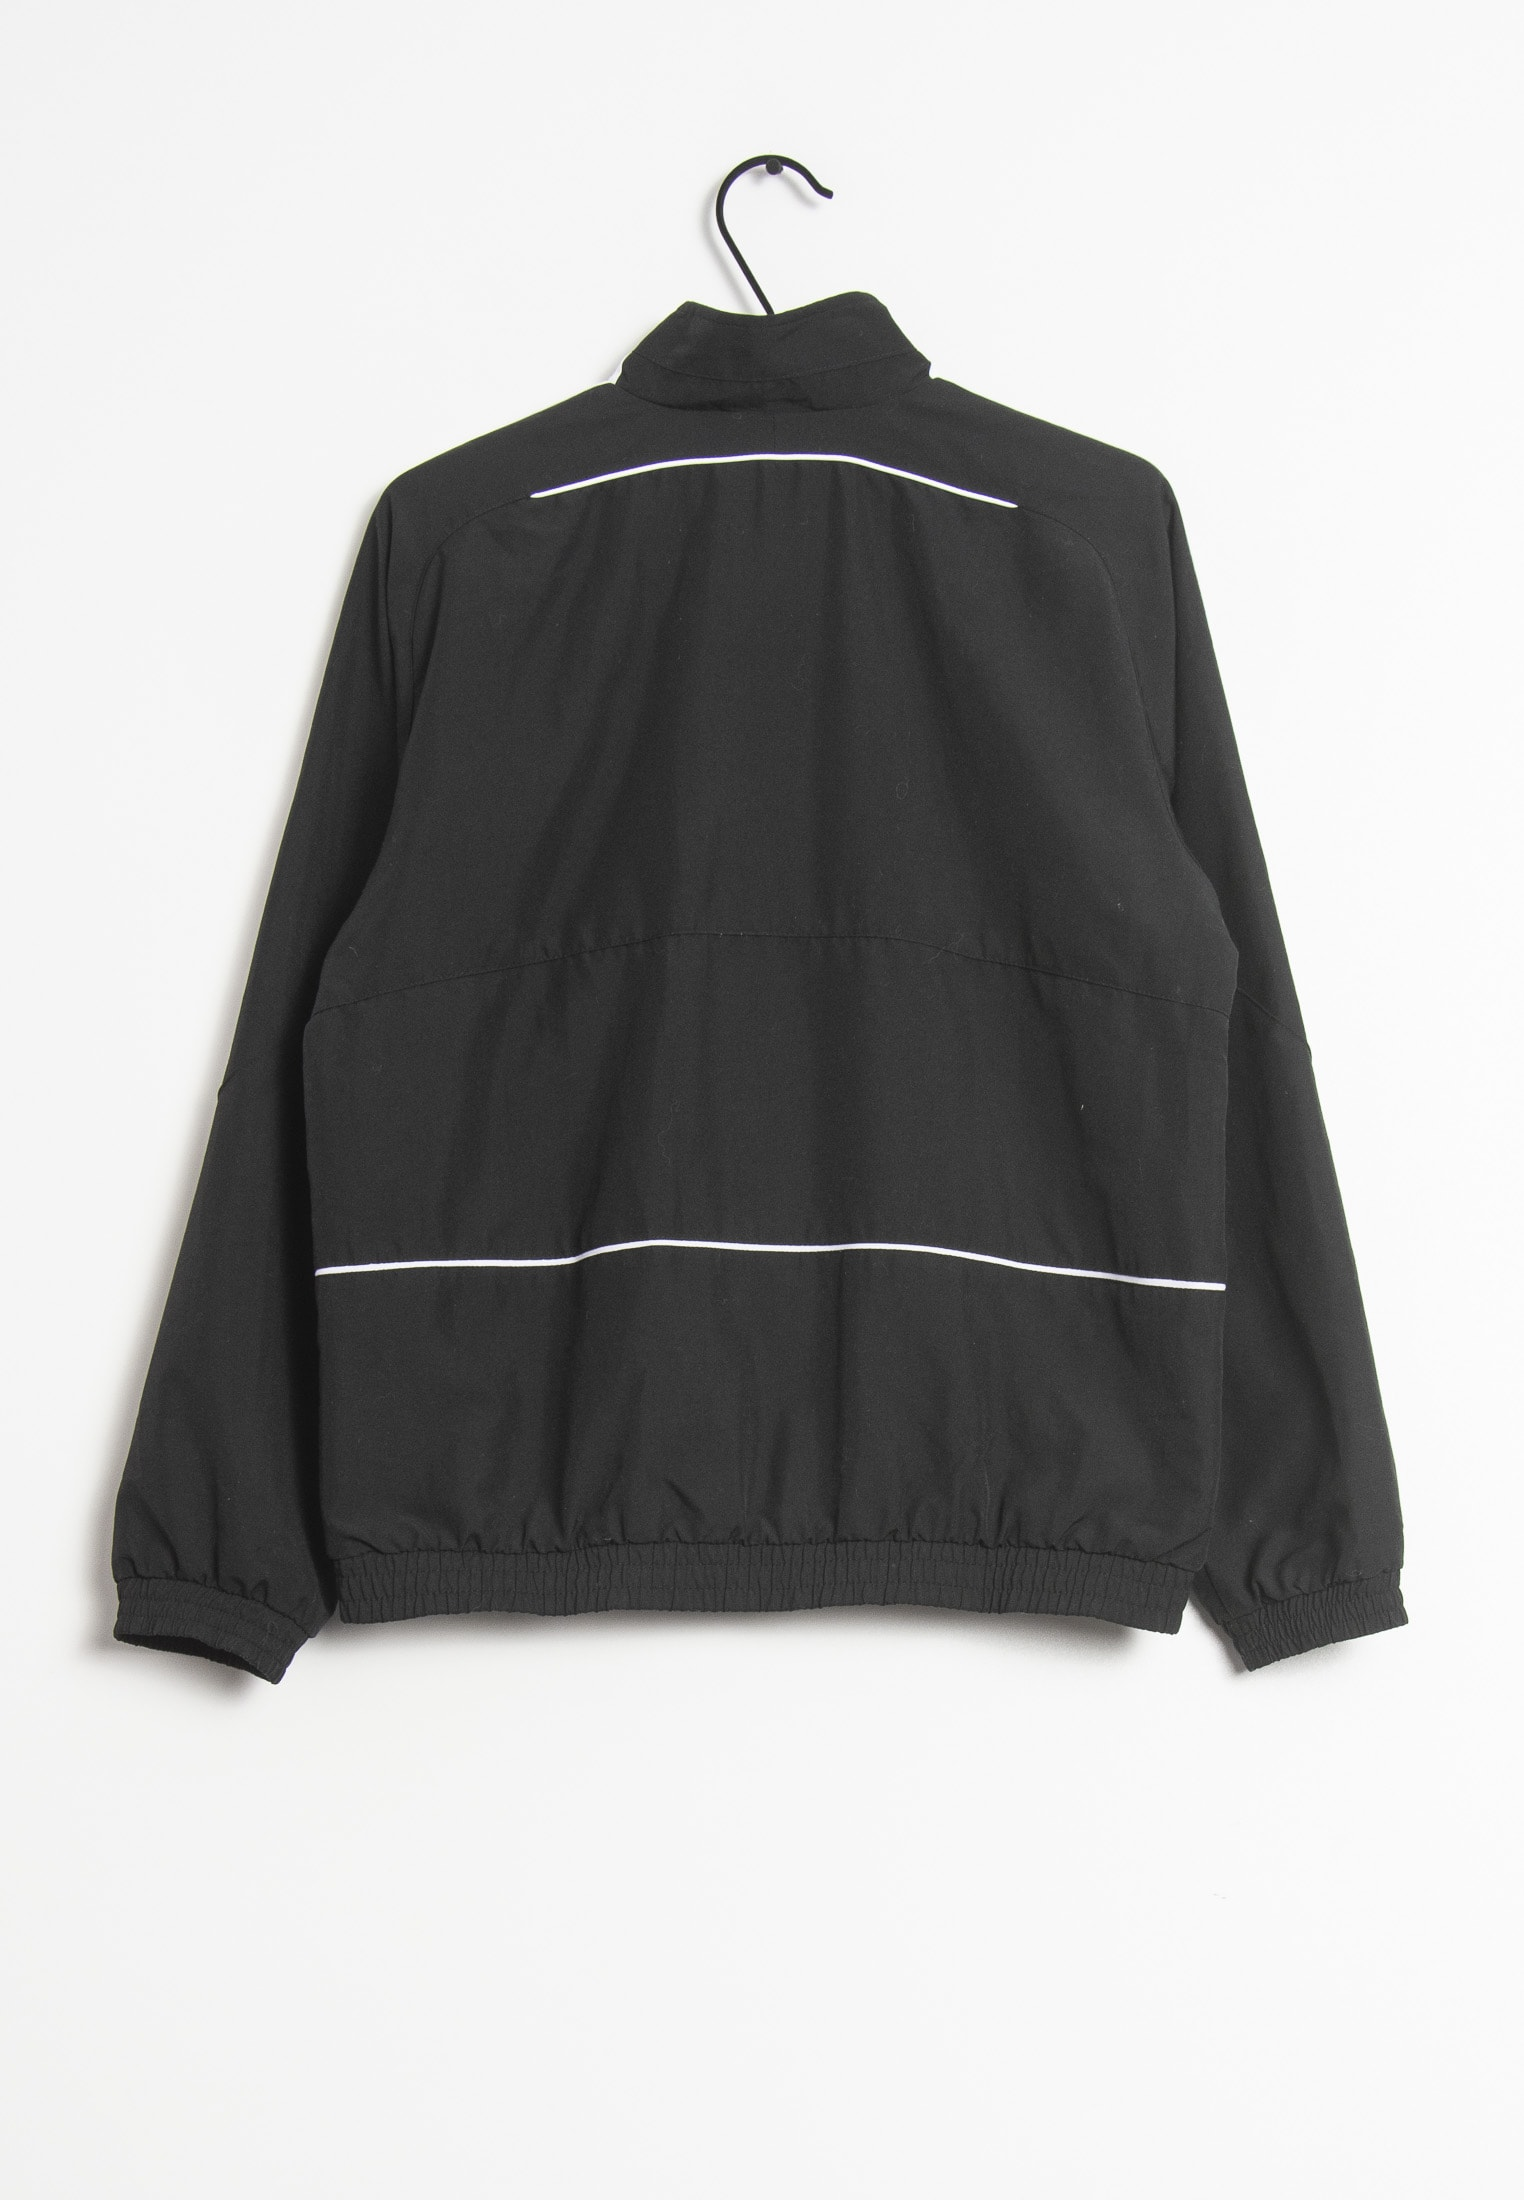 adidas Originals Sweat / Fleece Schwarz Gr.34